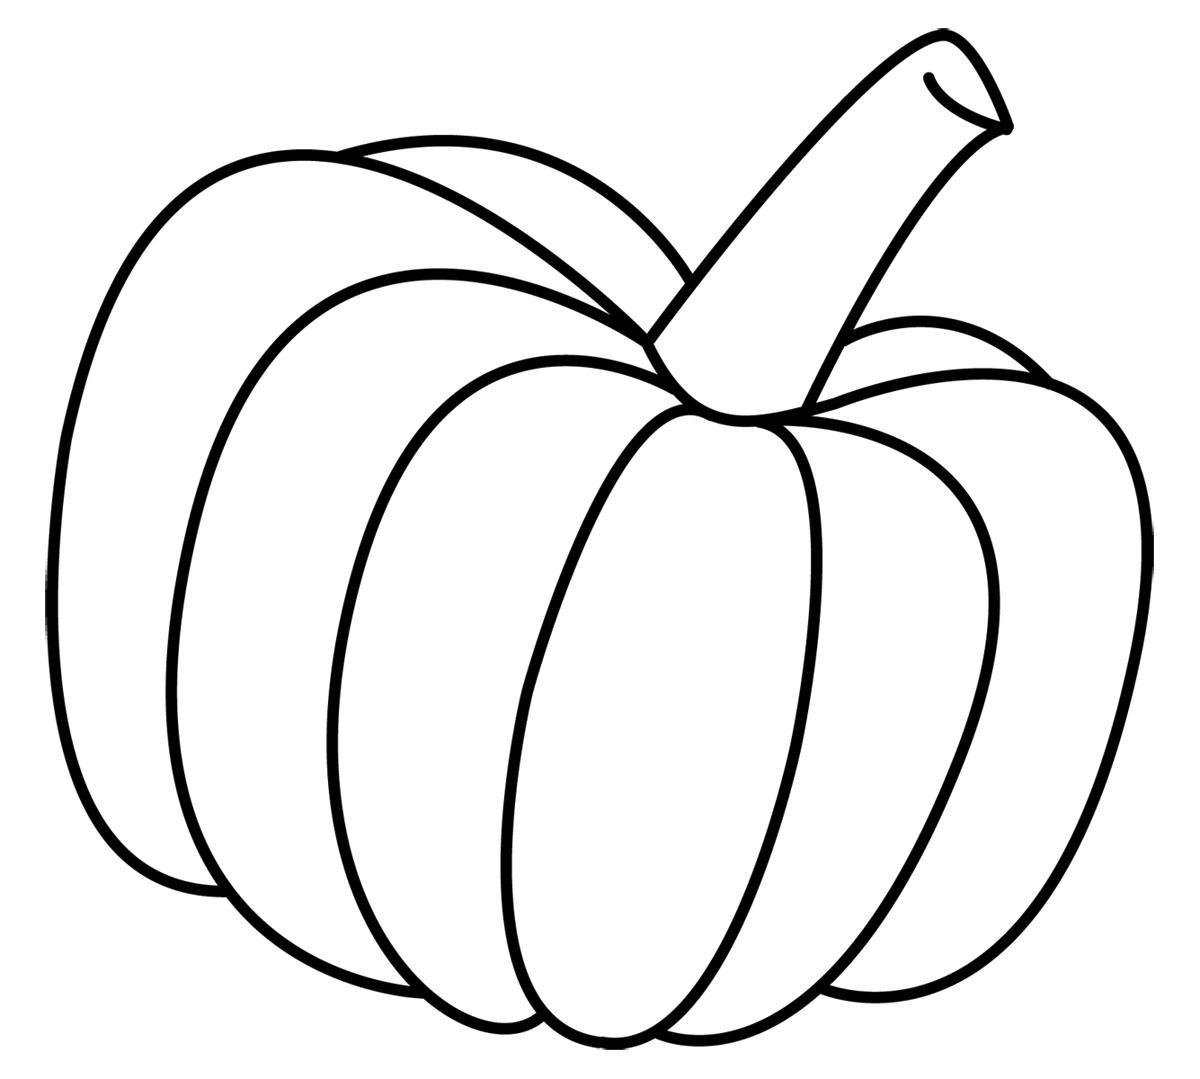 1200x1079 Black And White Halloween Pumpkin Clipart Image